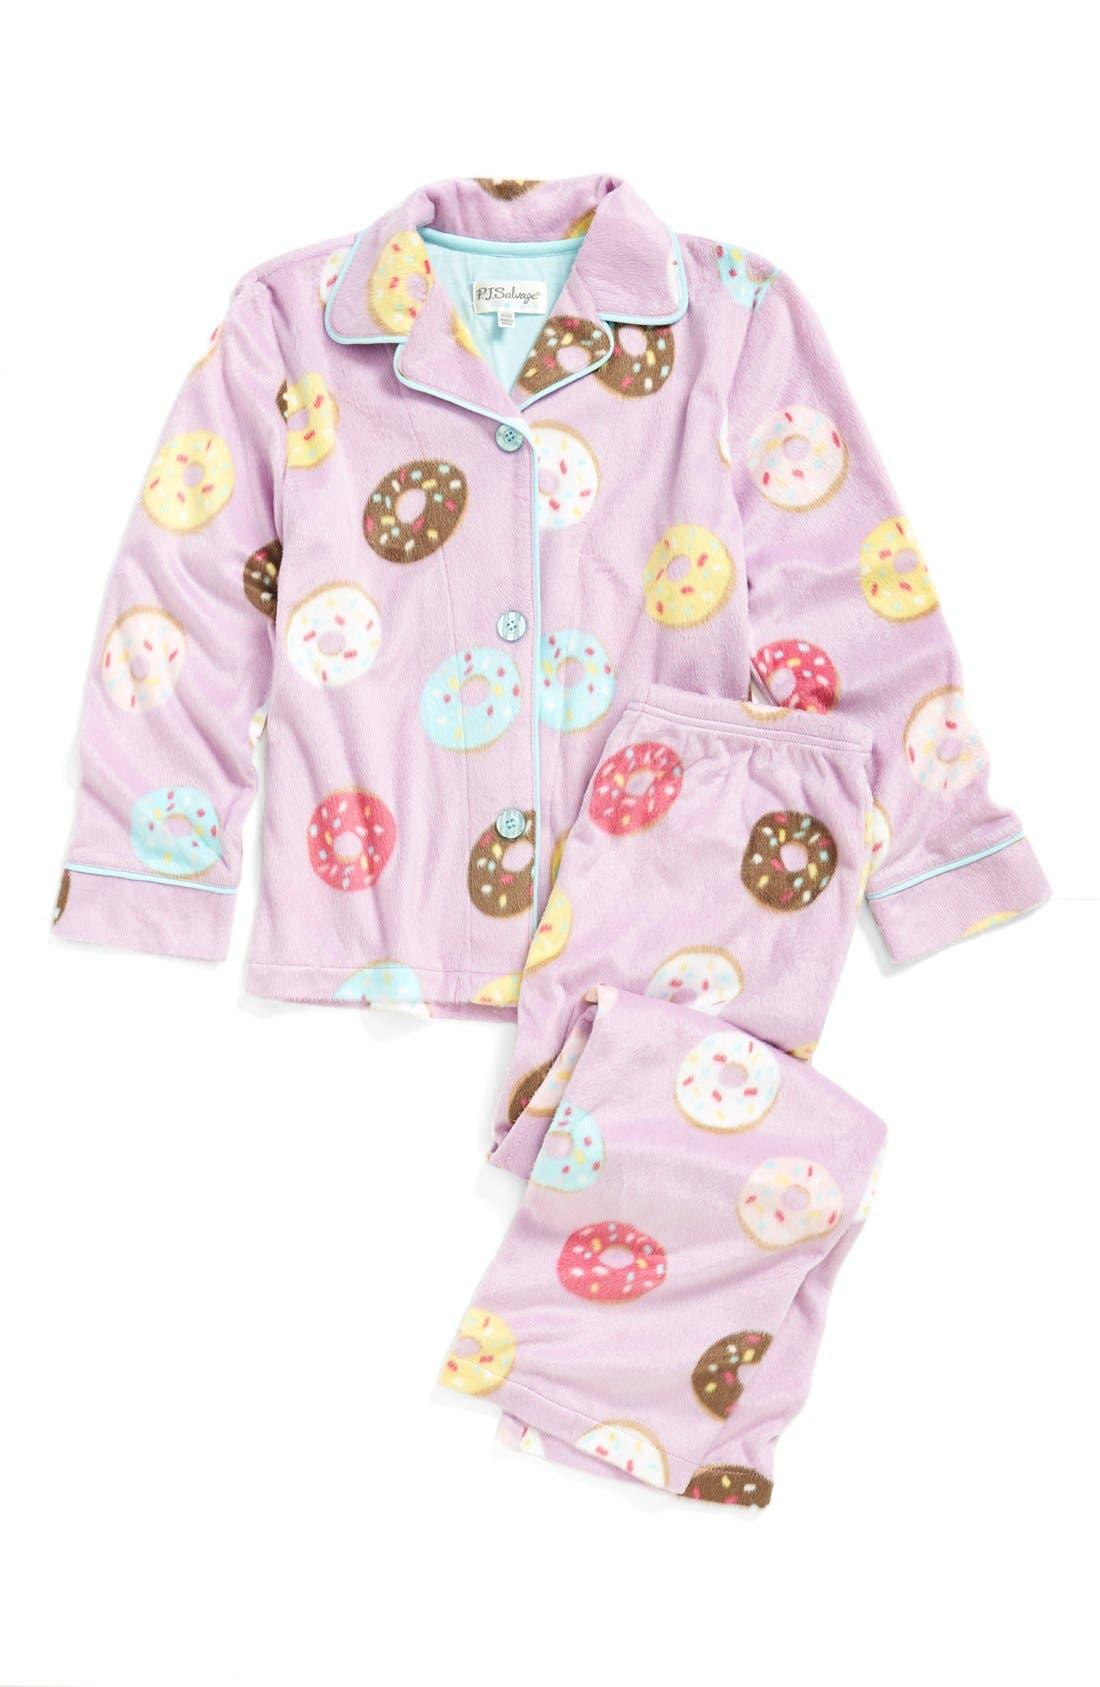 Alternate Image 1 Selected - PJ Salvage 'Donut' Two-Piece Pajamas (Little Girls & Big Girls)